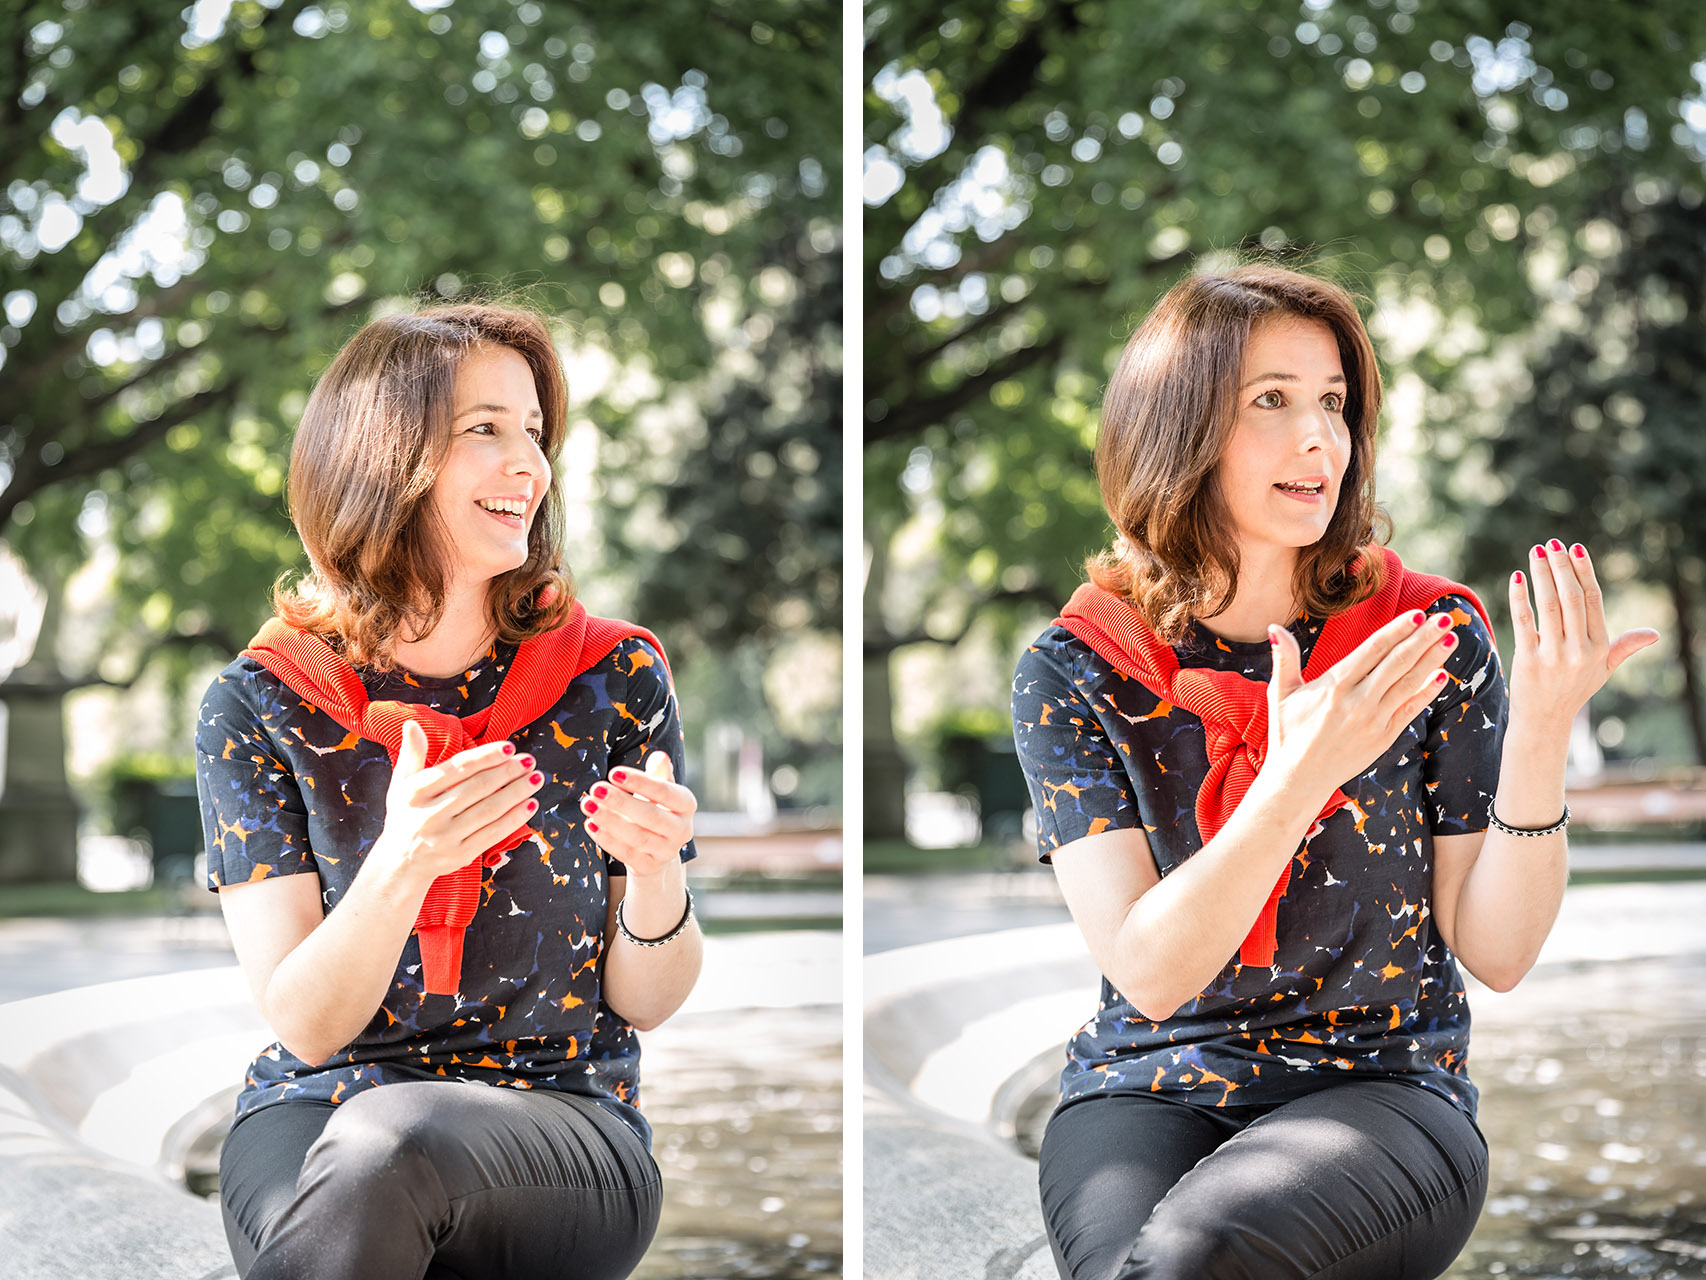 Schinner-Katharina--2er--©MichaelMazohl--1280px